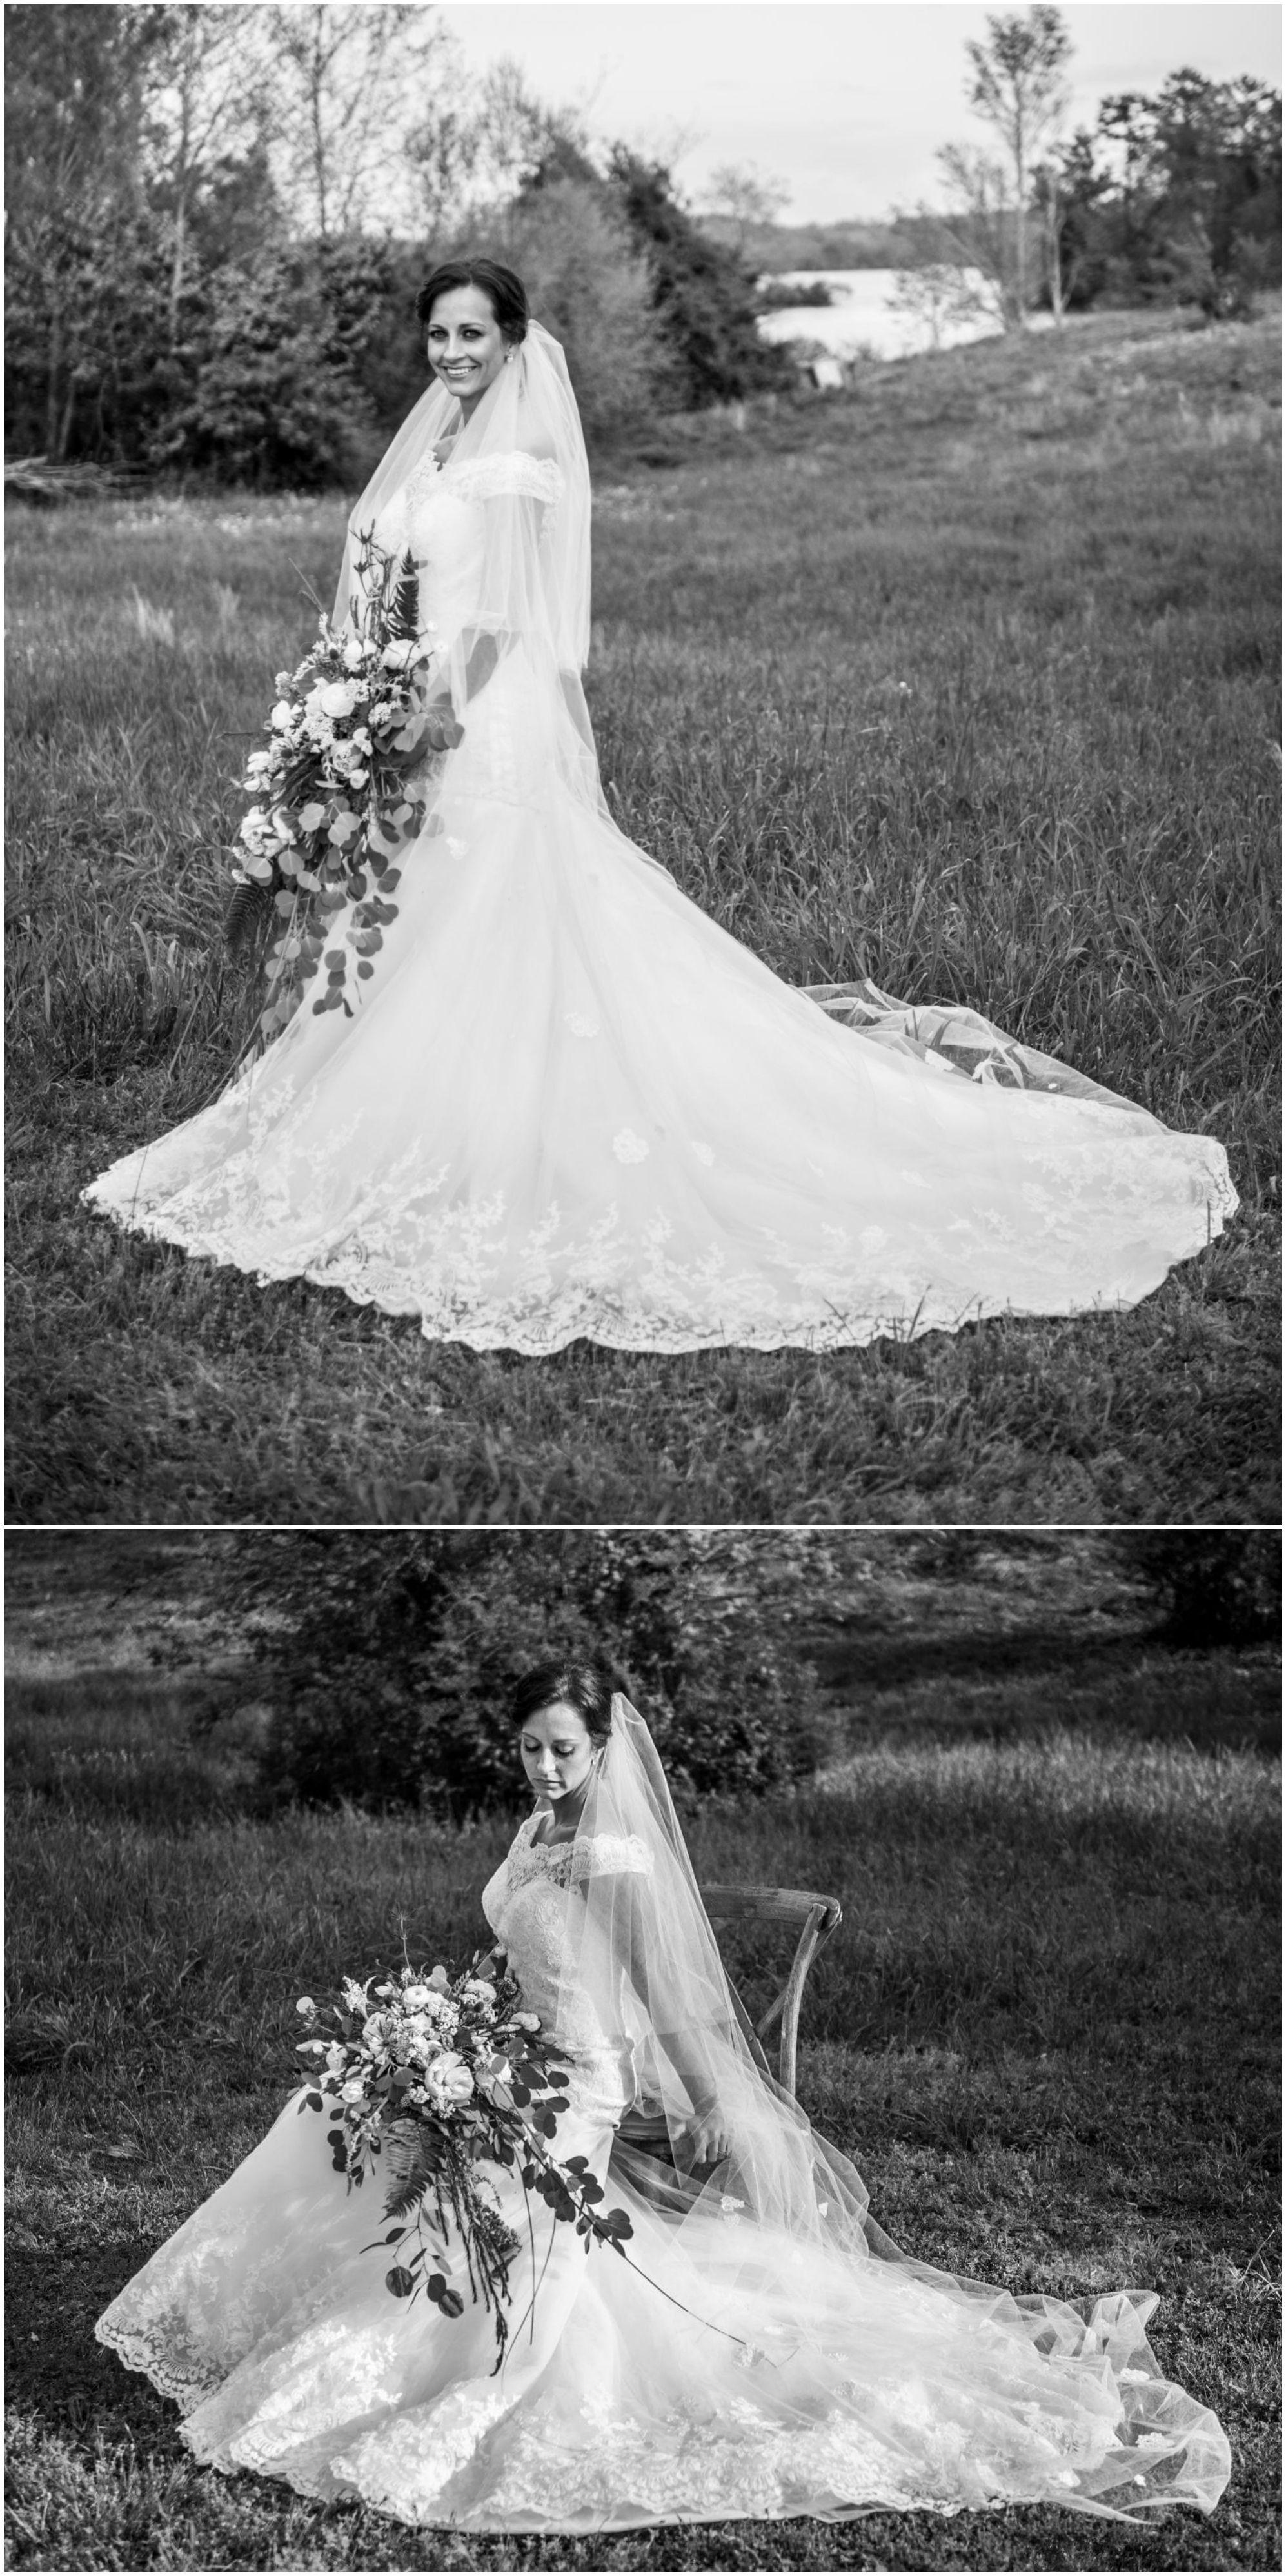 Indigo & Gold Rustic Romance Styled Shoot - Kingston, TN | Wedding ...